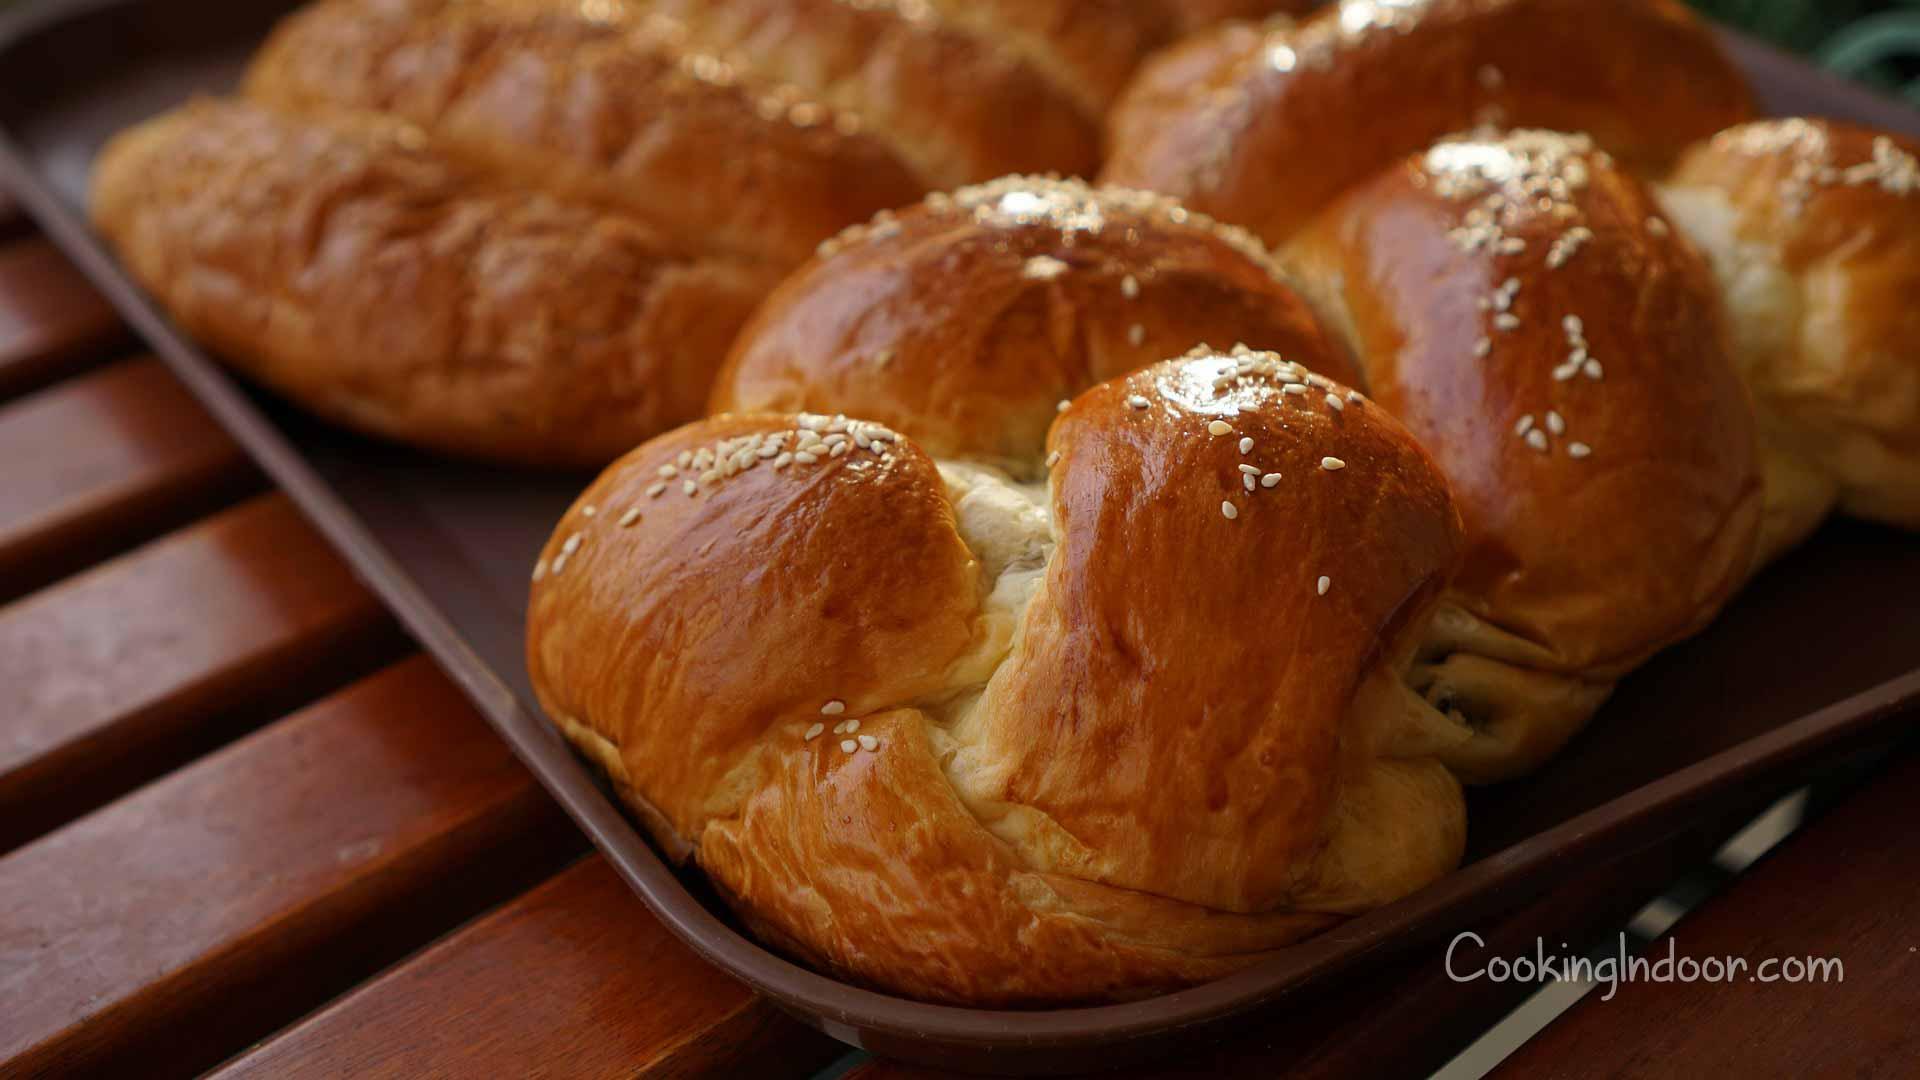 Best bread to make panini